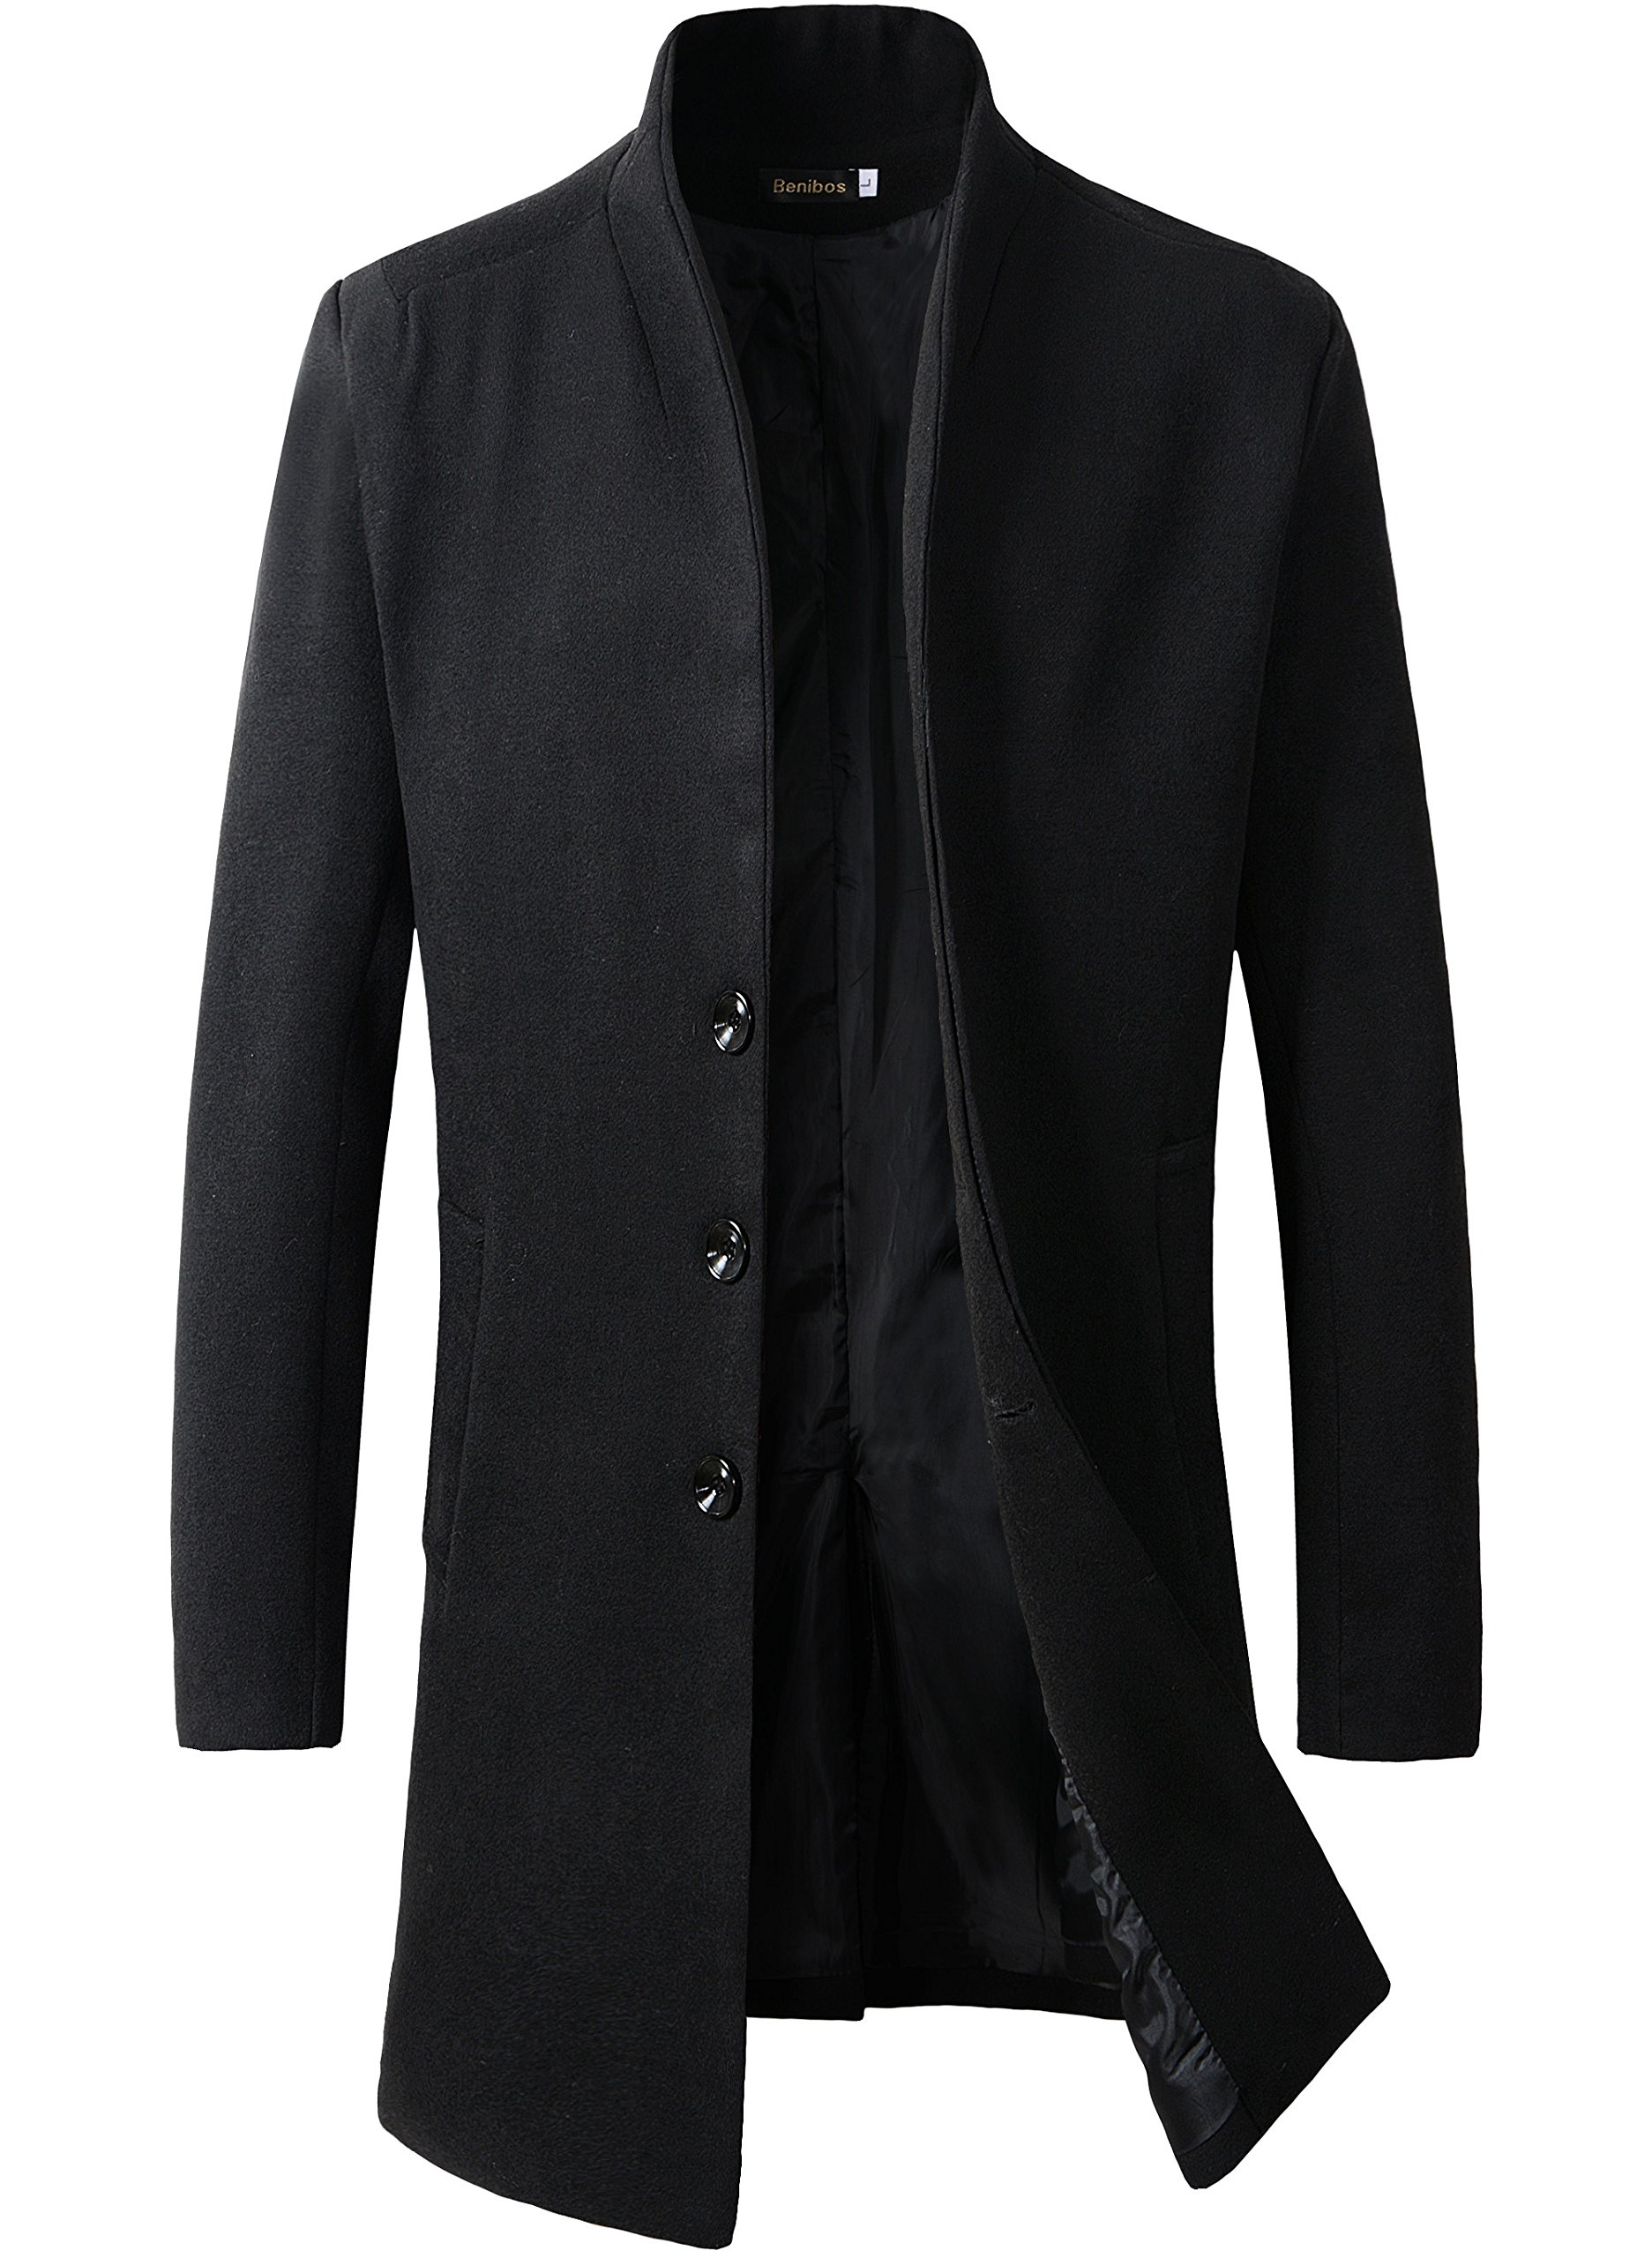 Benibos Men's Trench Coat Winter Long Jacket Button Closer Overcoat (M, 168Black)